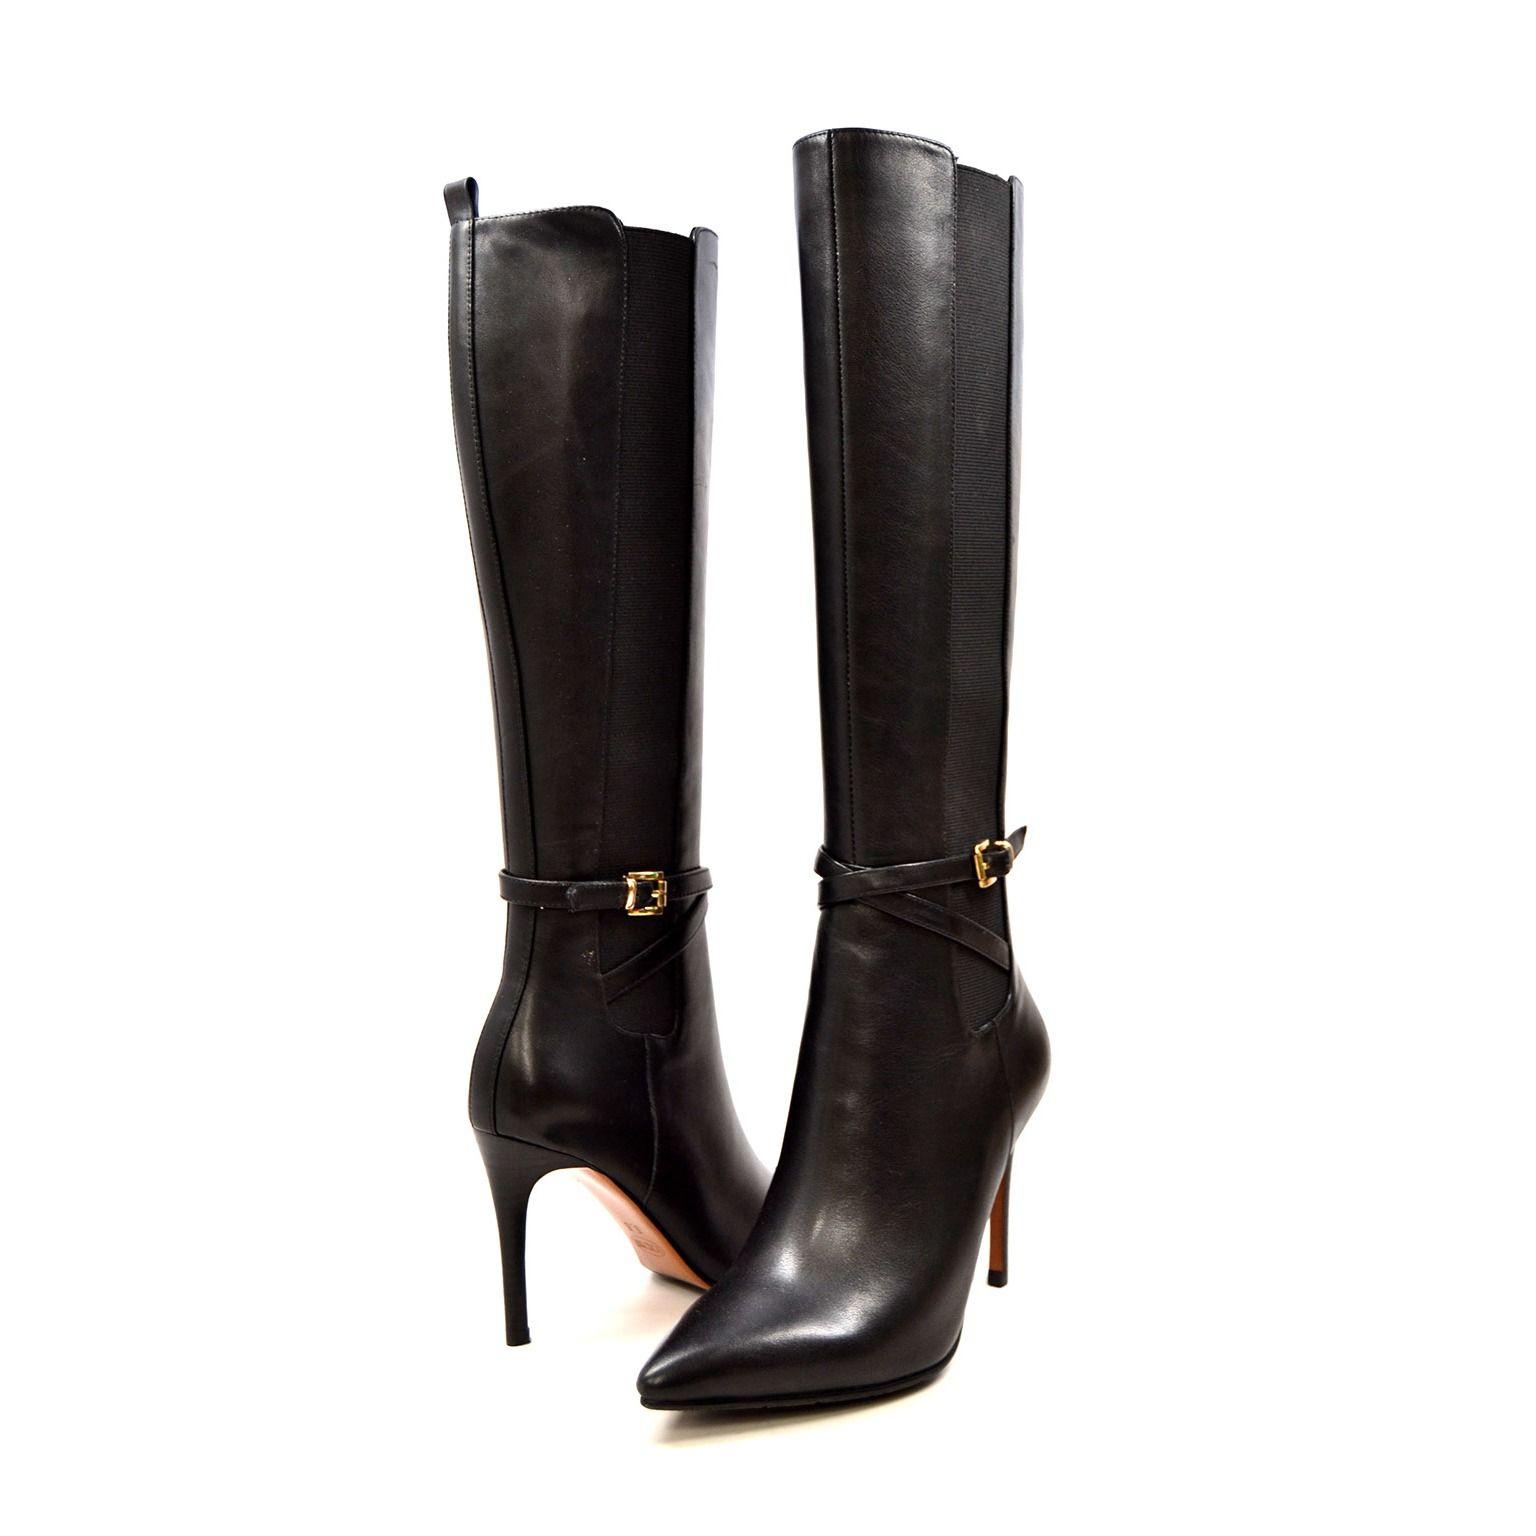 Bodycon dress knee high boots narrow calves quacker factory jefferson